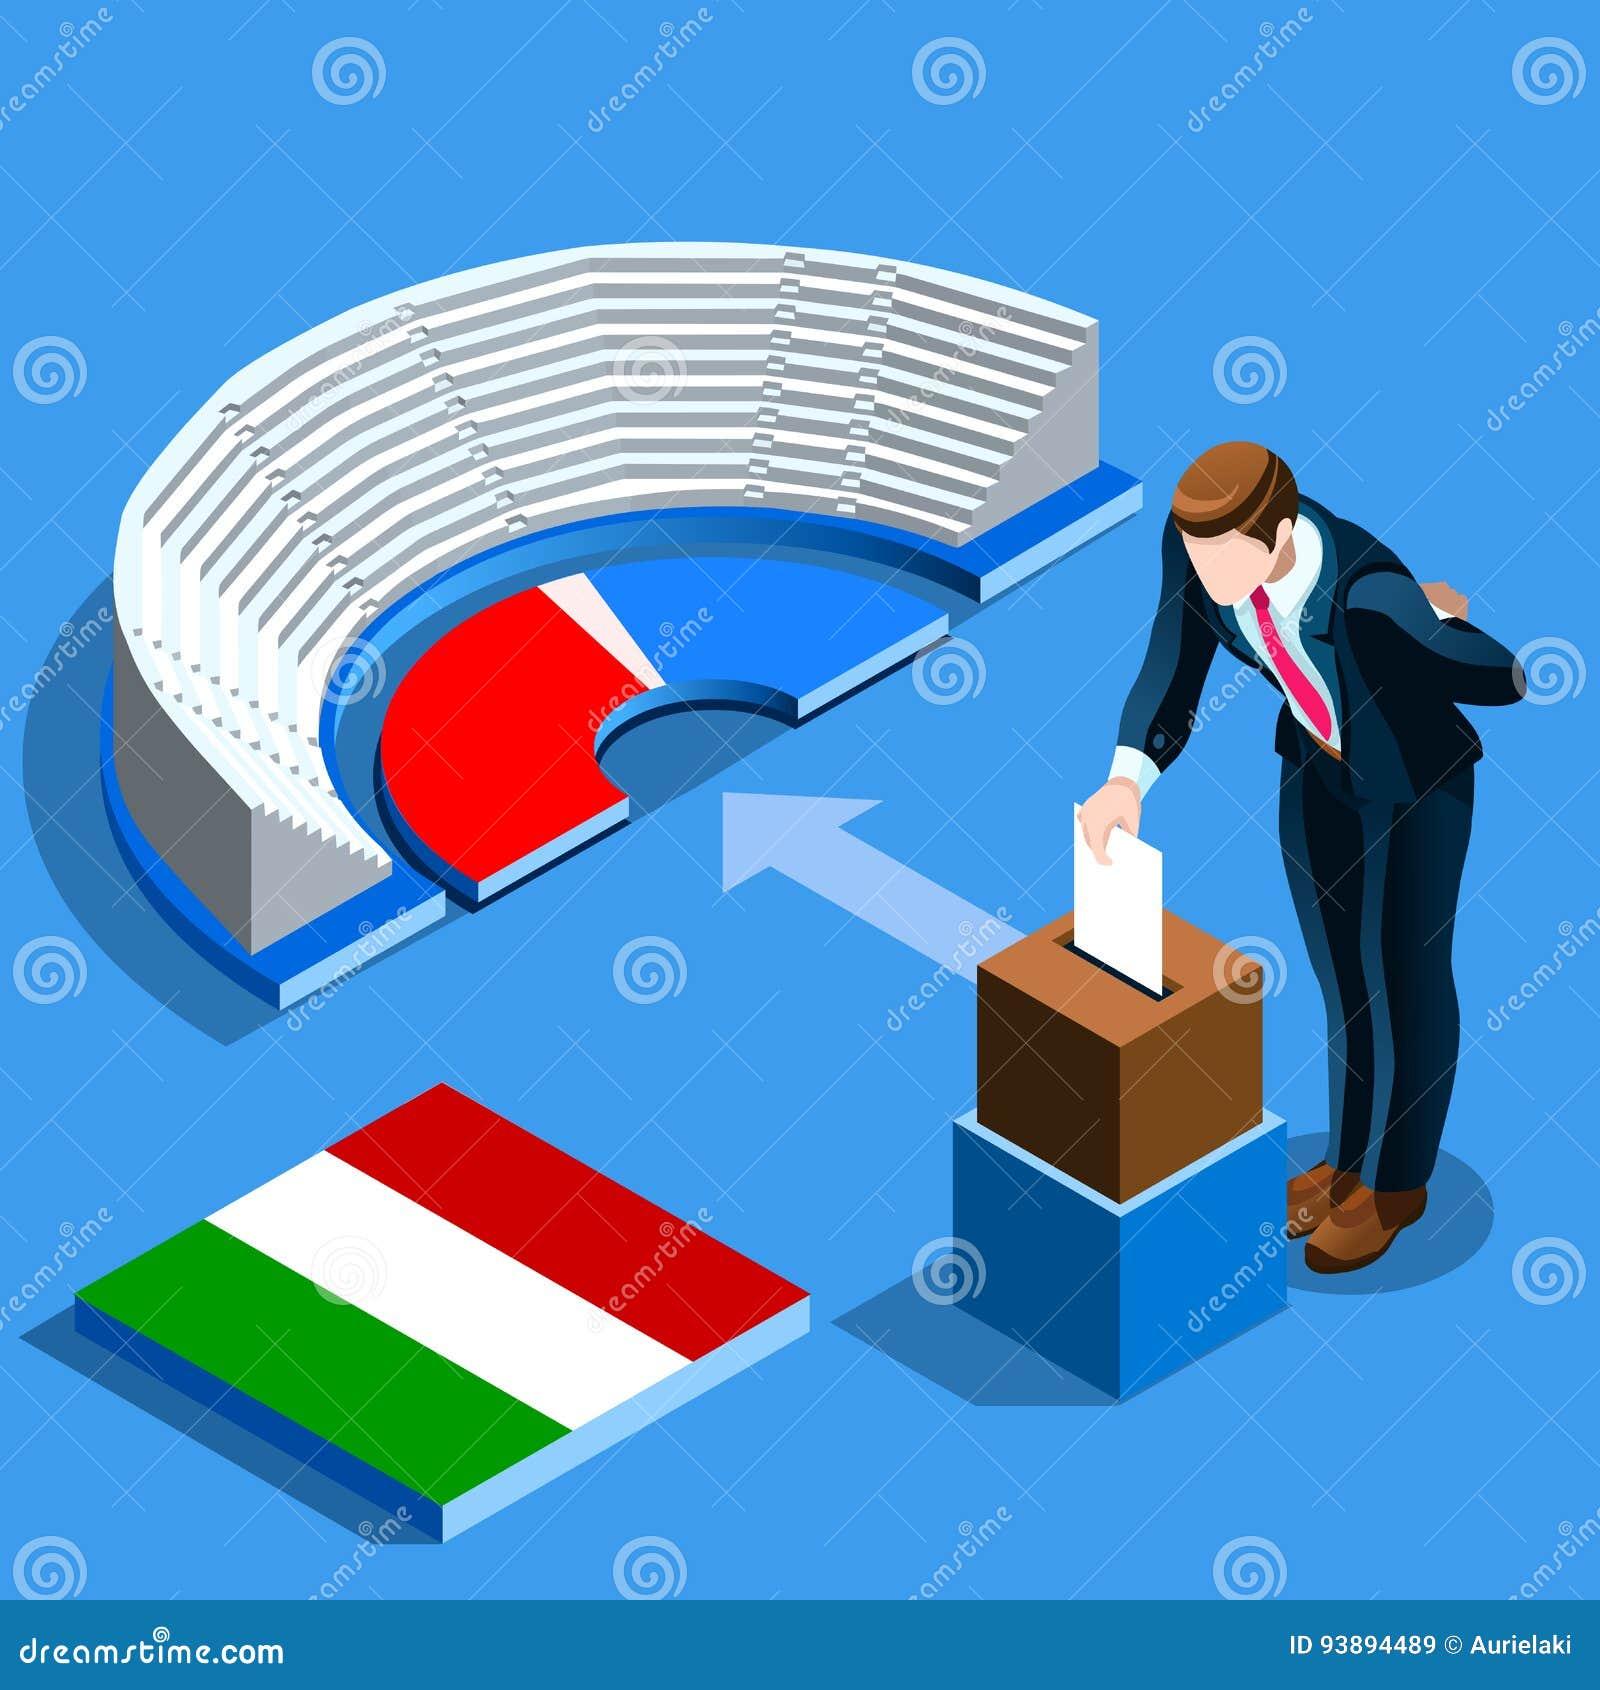 Italy Election Italian People Vote at Isometric Ballot Box